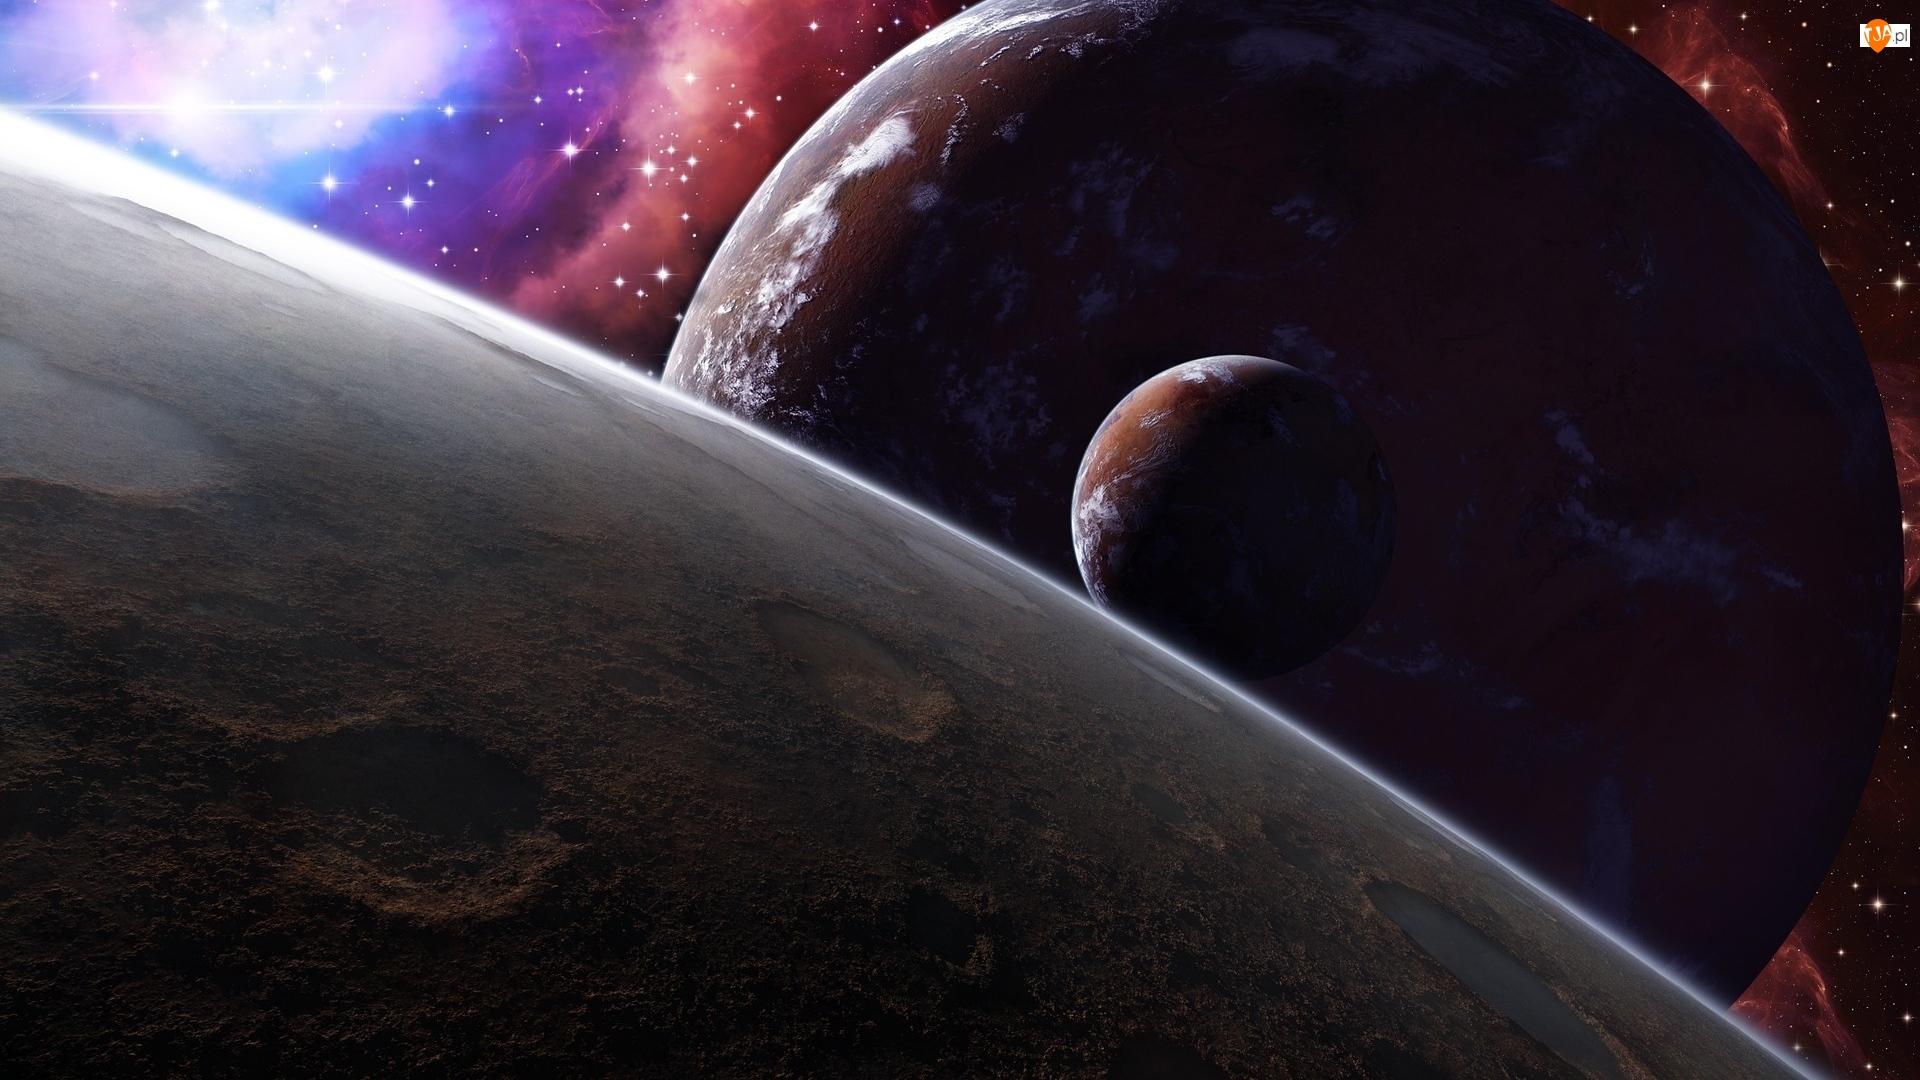 Gwiazdy, 2D, Planety, Kosmos, Galaktyka